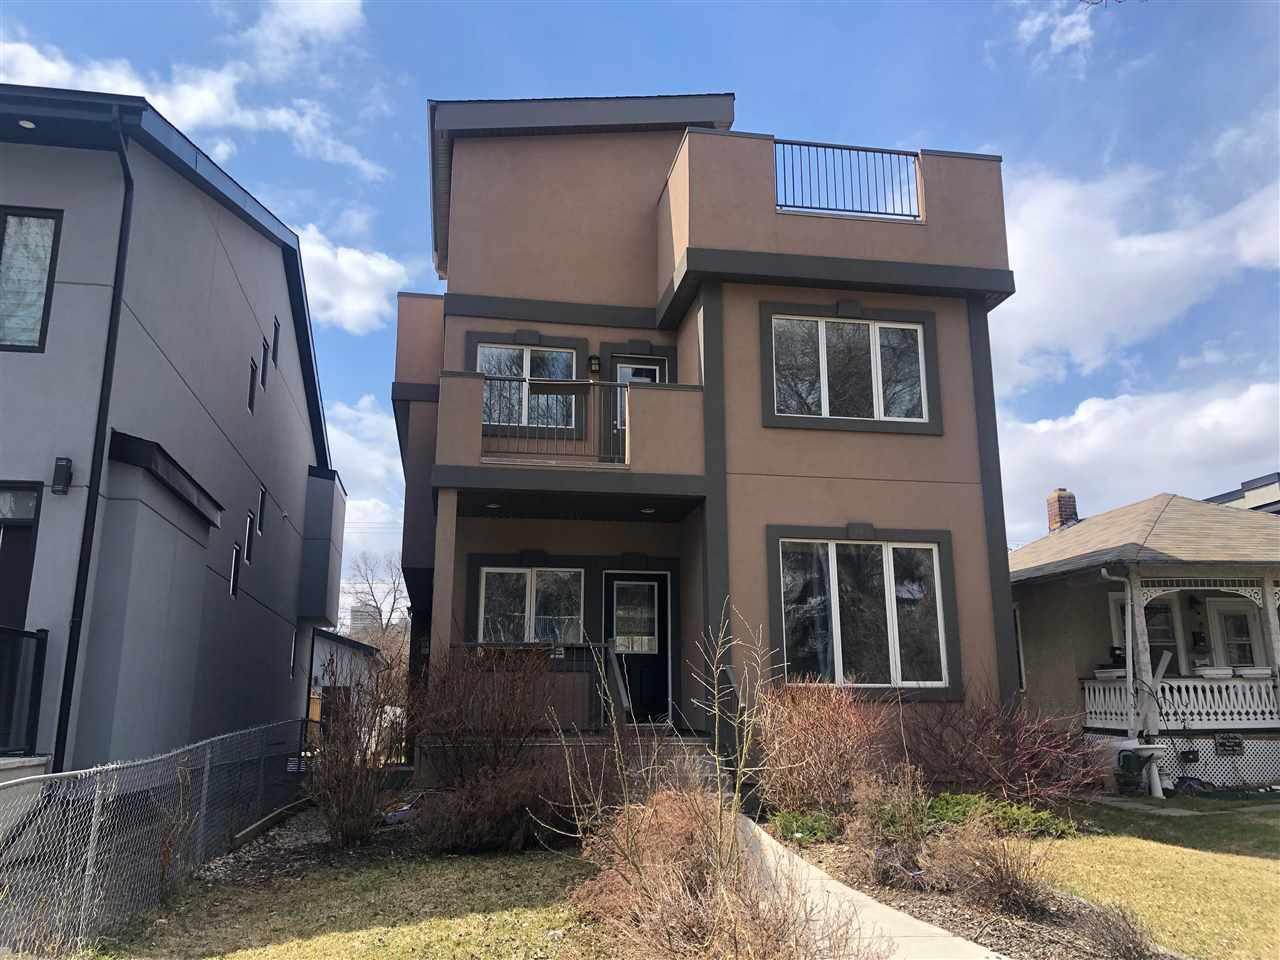 Main Photo: 10228 88 Street in Edmonton: Zone 13 House for sale : MLS®# E4149272